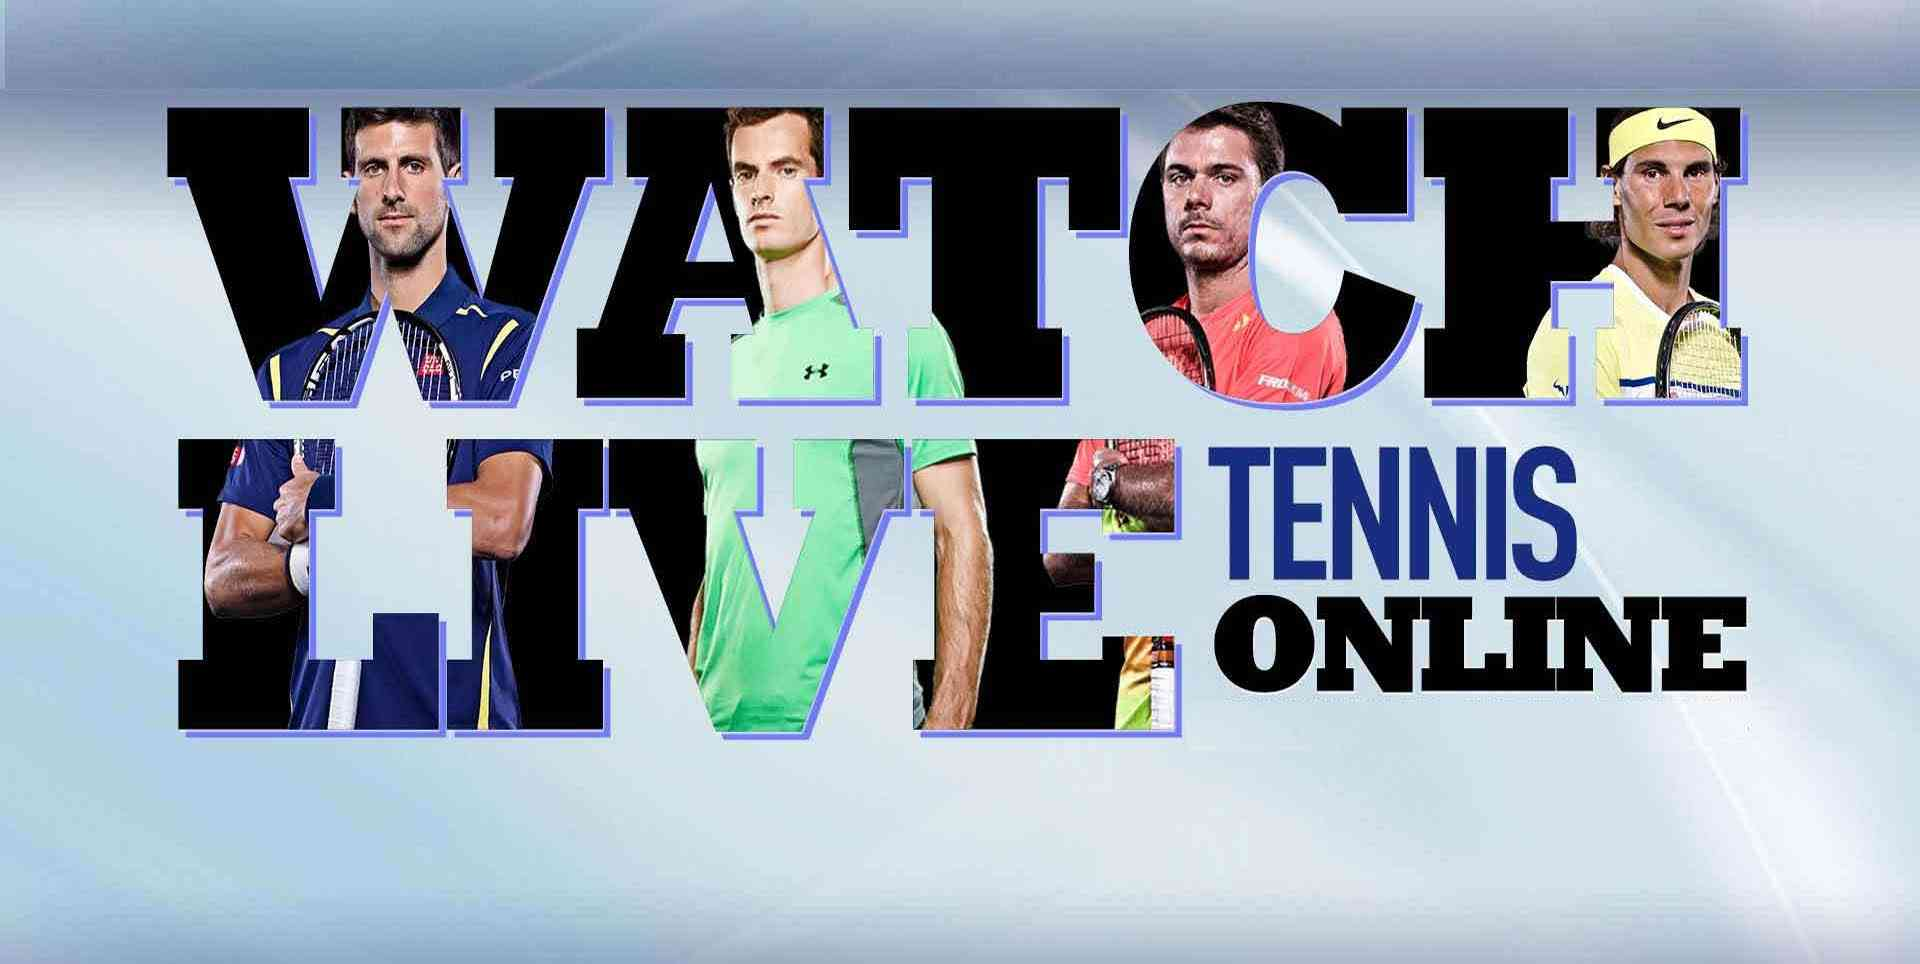 Watch A. Peya|B. Soares vs D. Nestor|N. Zimonjic  Online